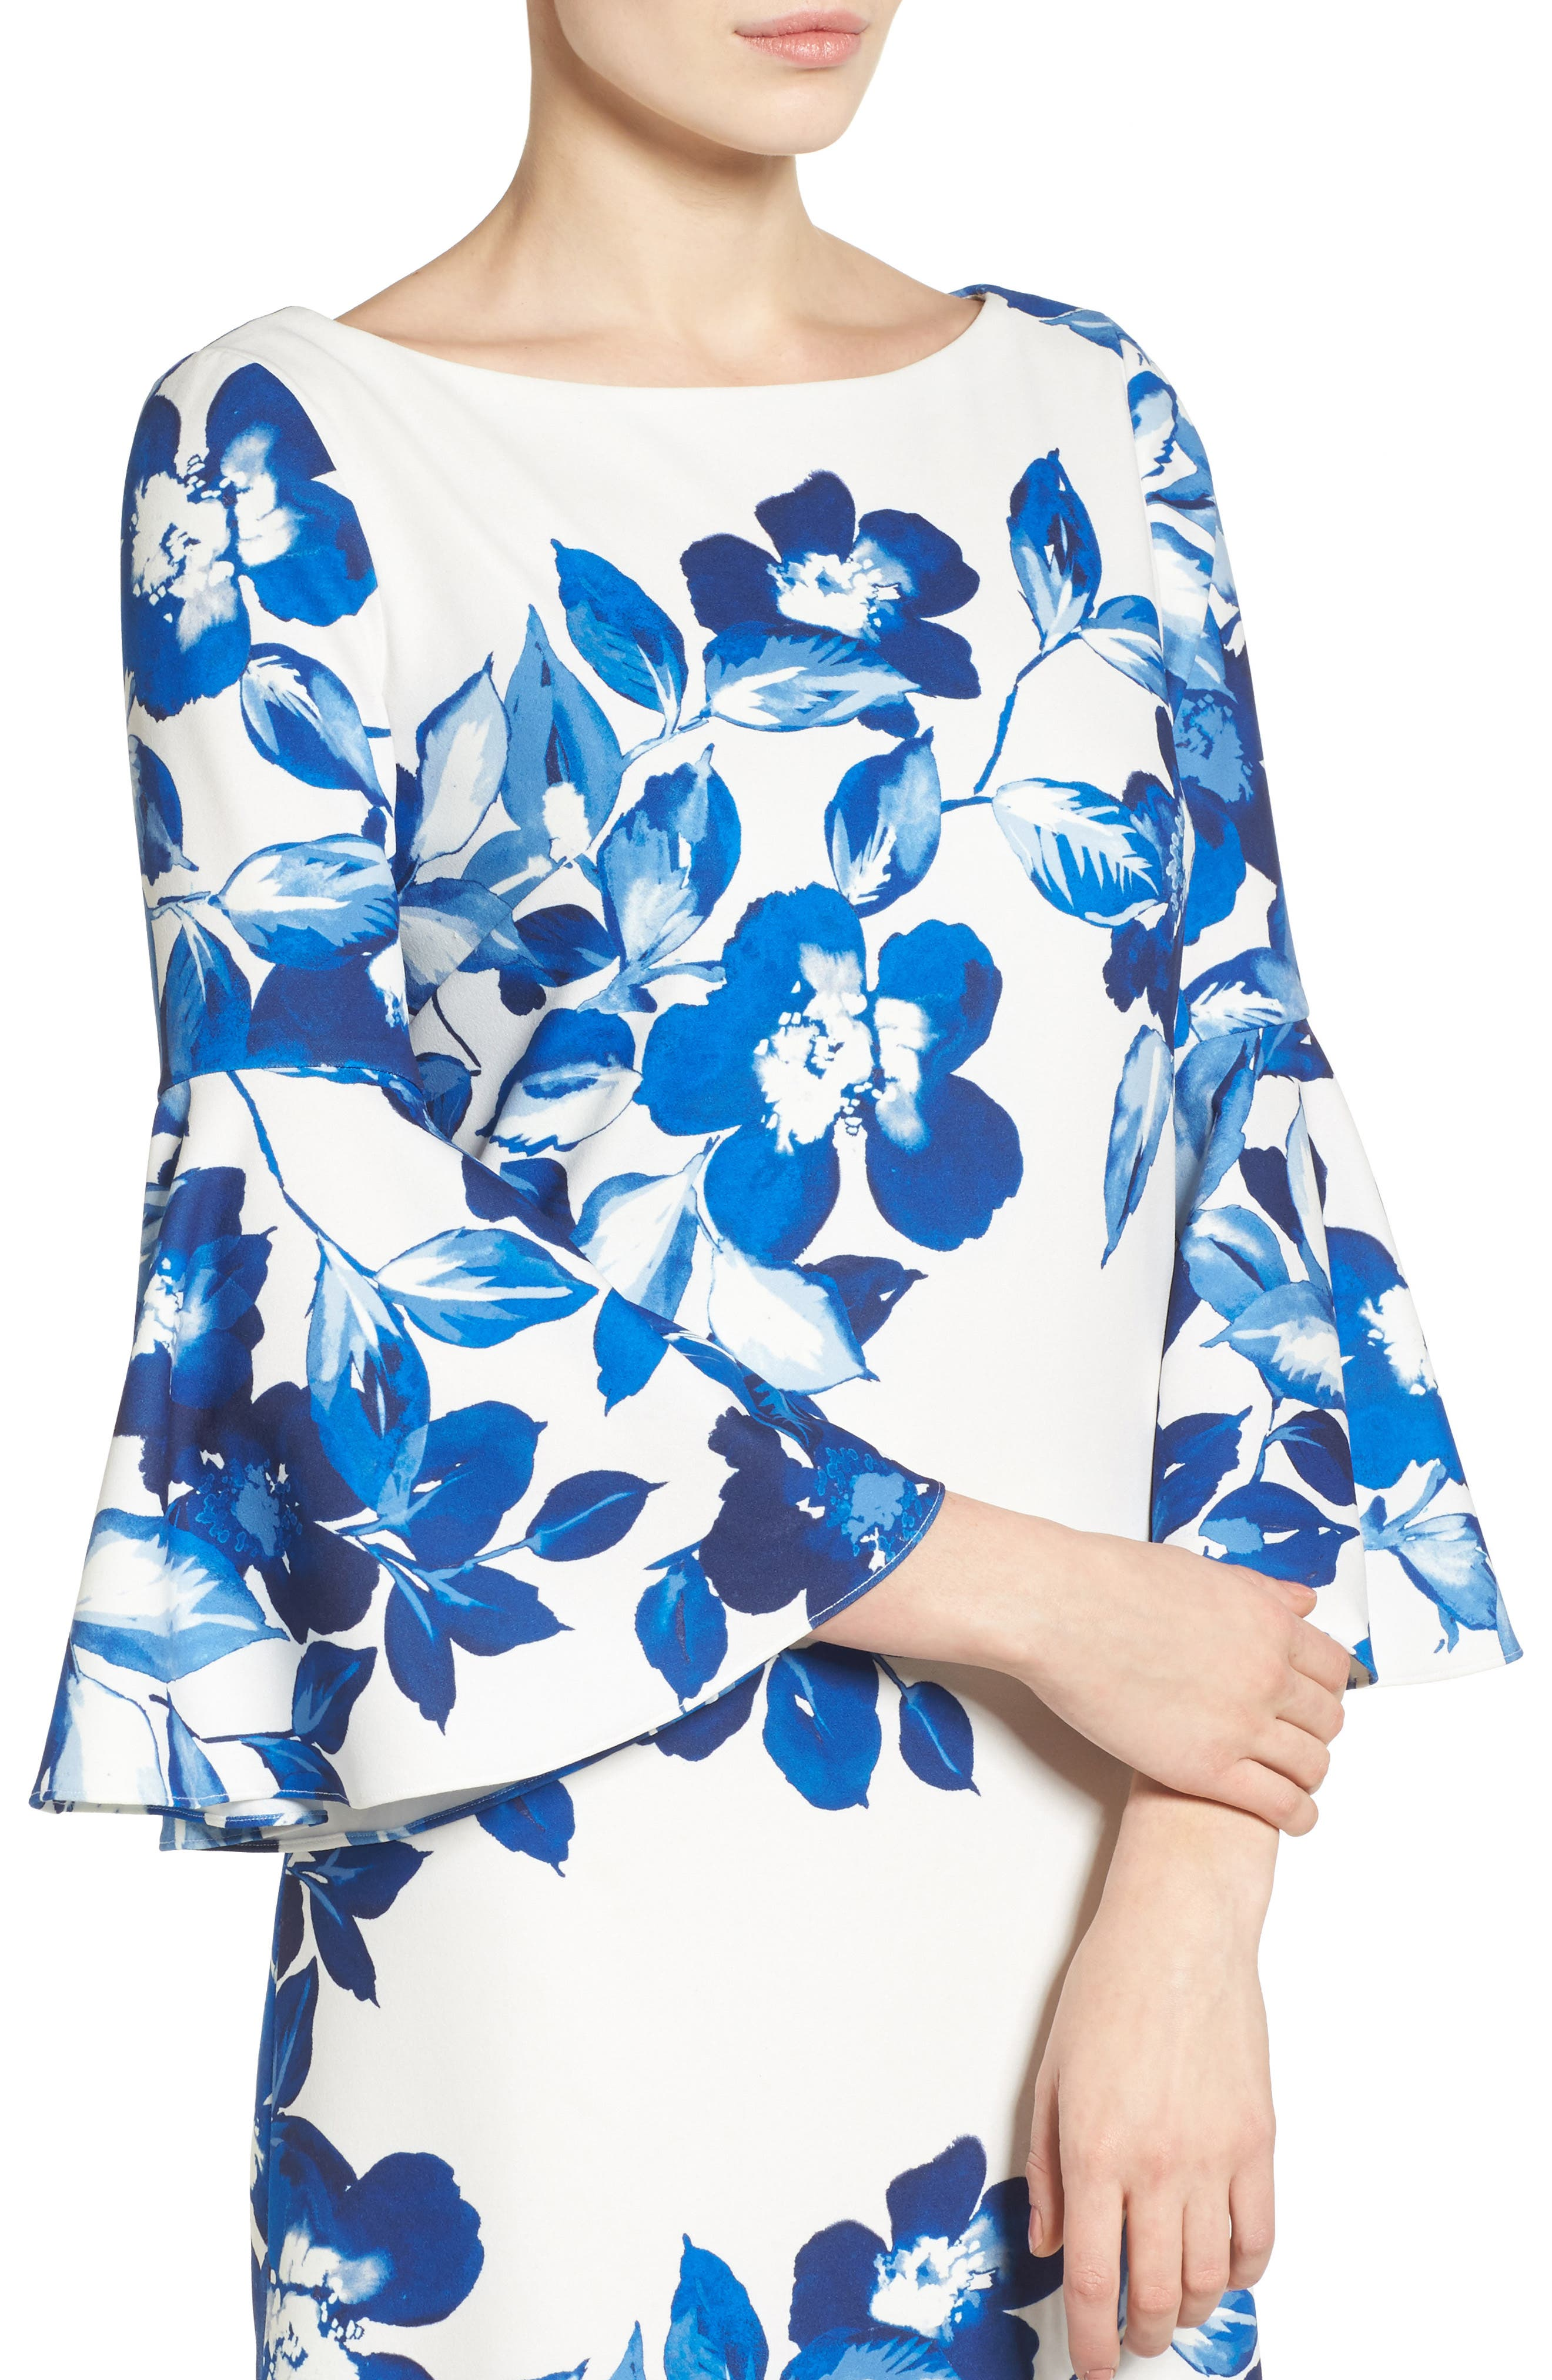 Floral Shift Dress,                             Alternate thumbnail 4, color,                             BLUE/ IVORY